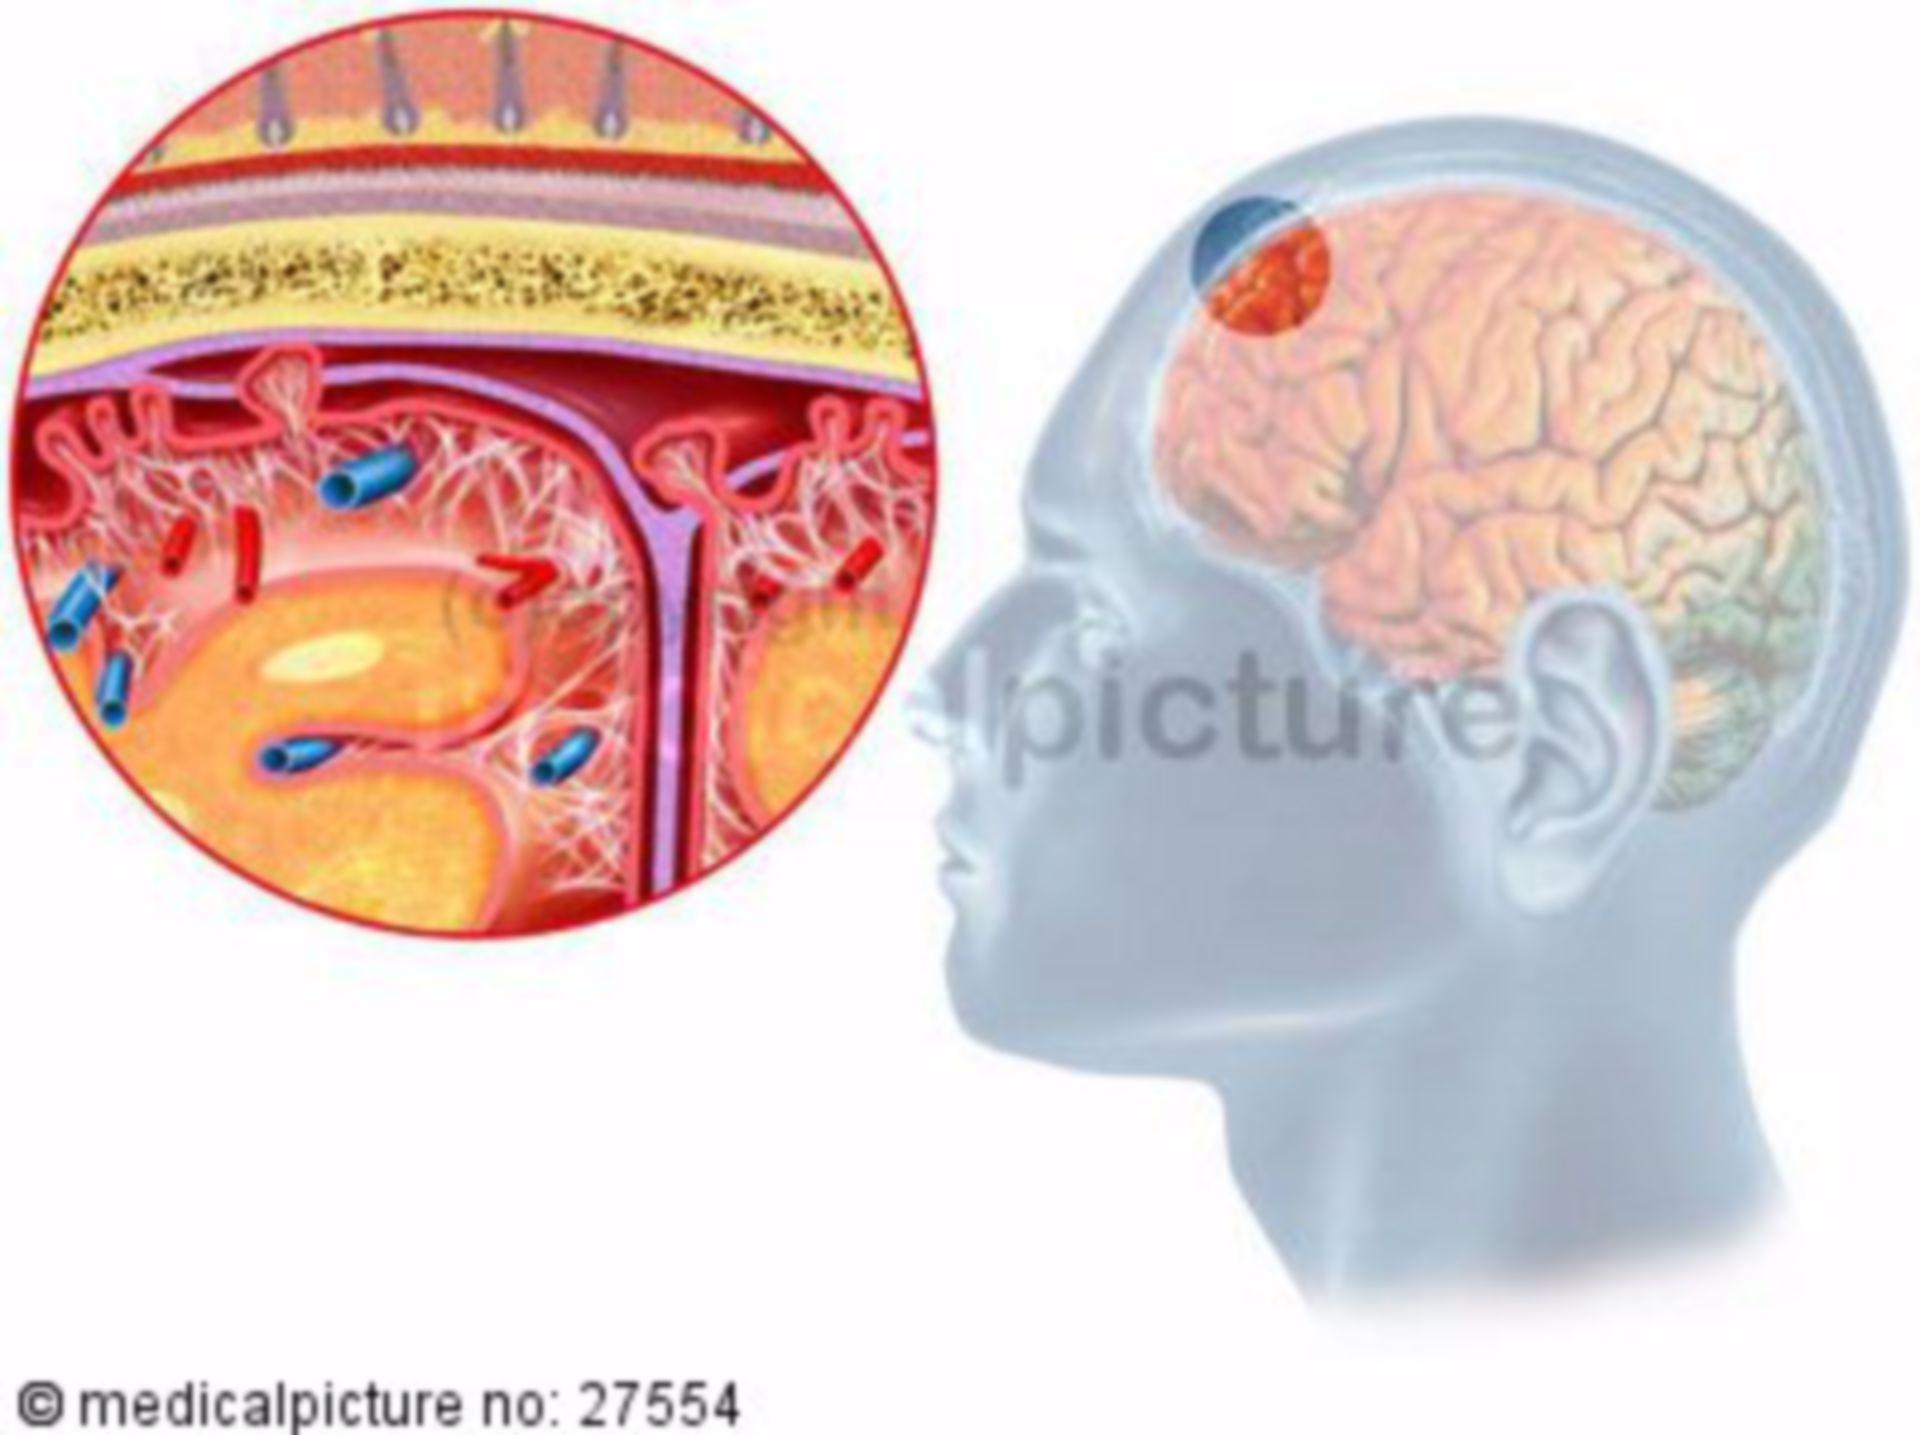 Hirnhautentzündung, Meningitis